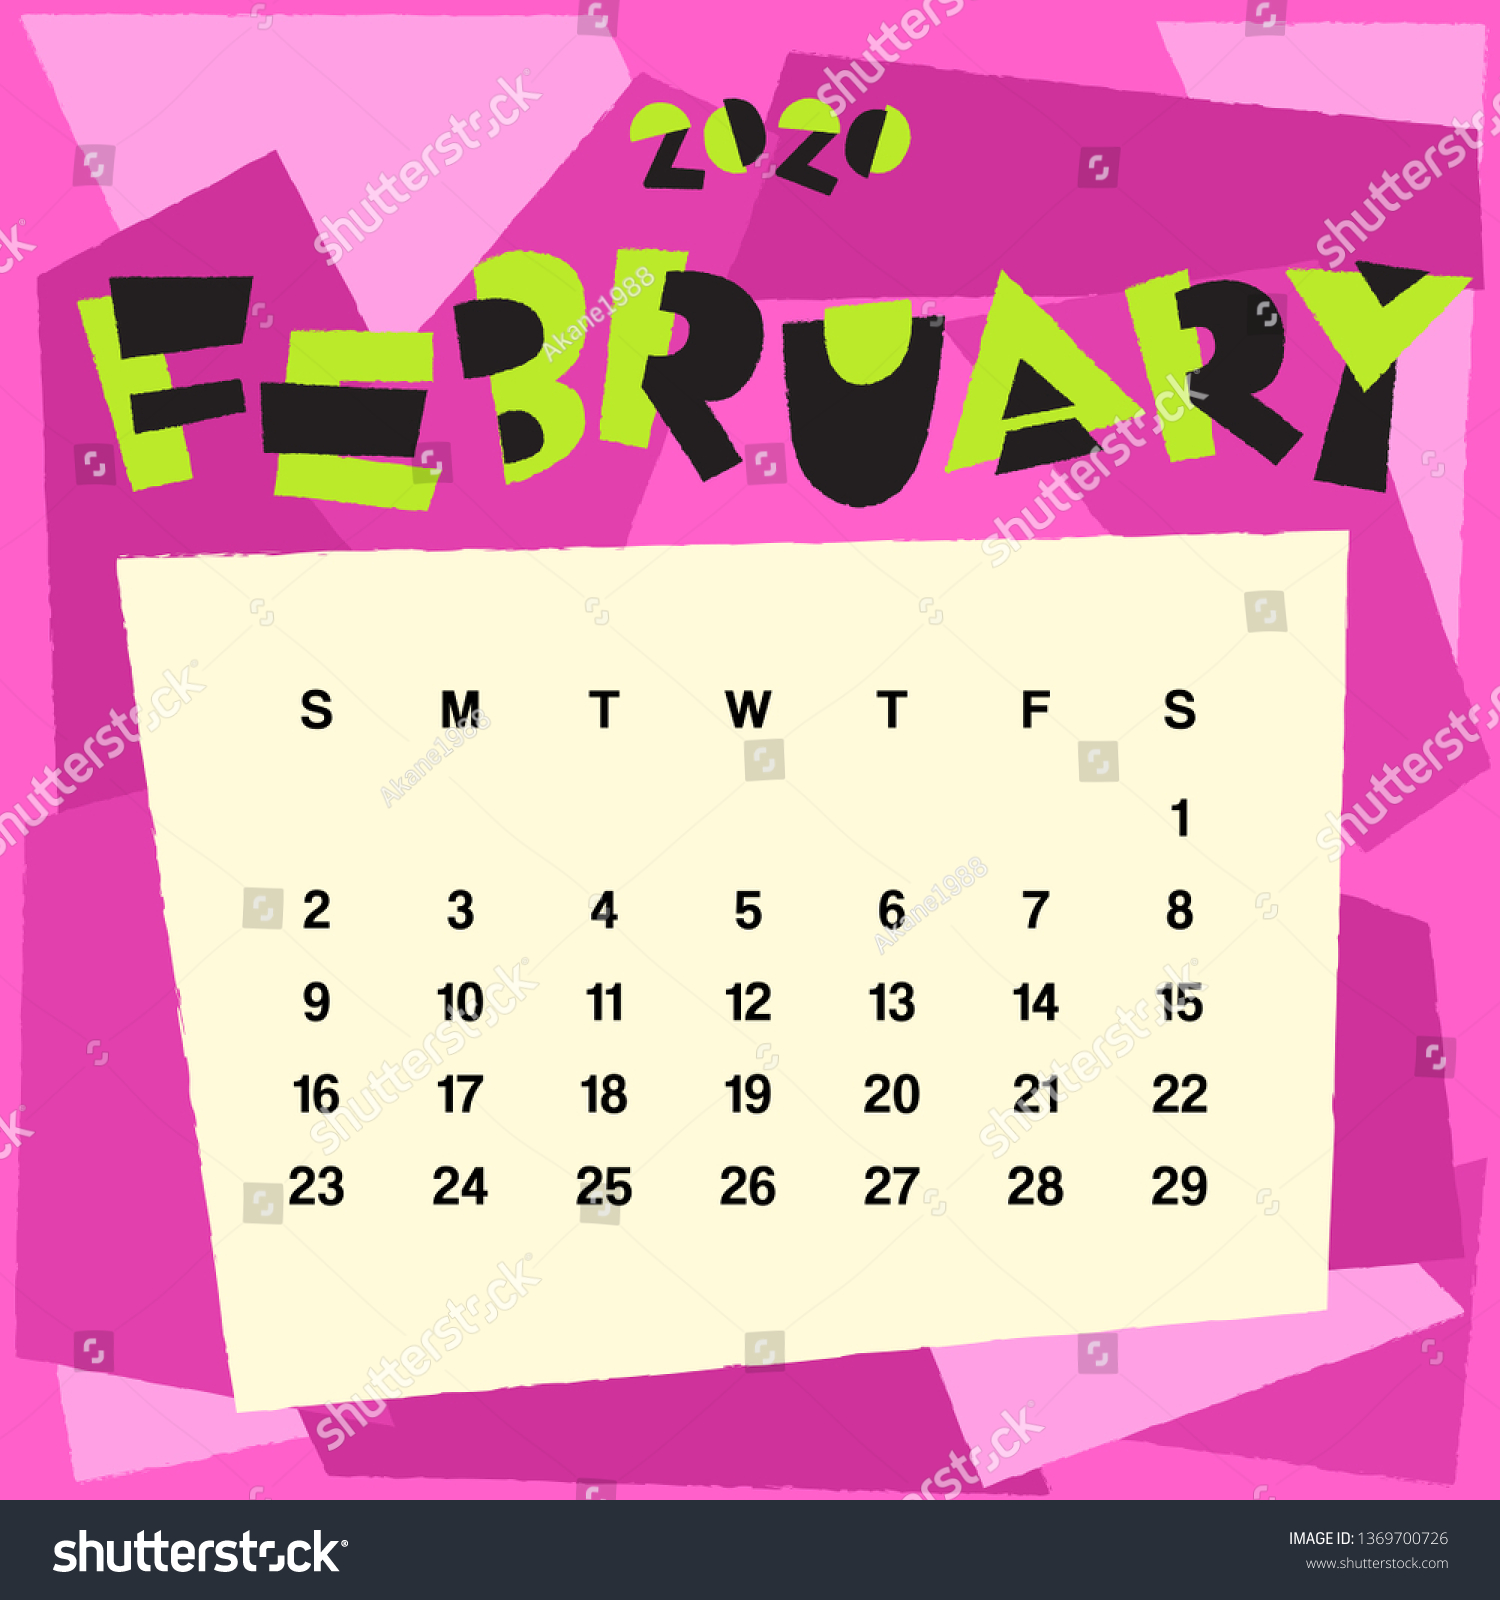 February Calendar 2020 Background February Calendar 2020 Template Monthly Calendar Stock Vector